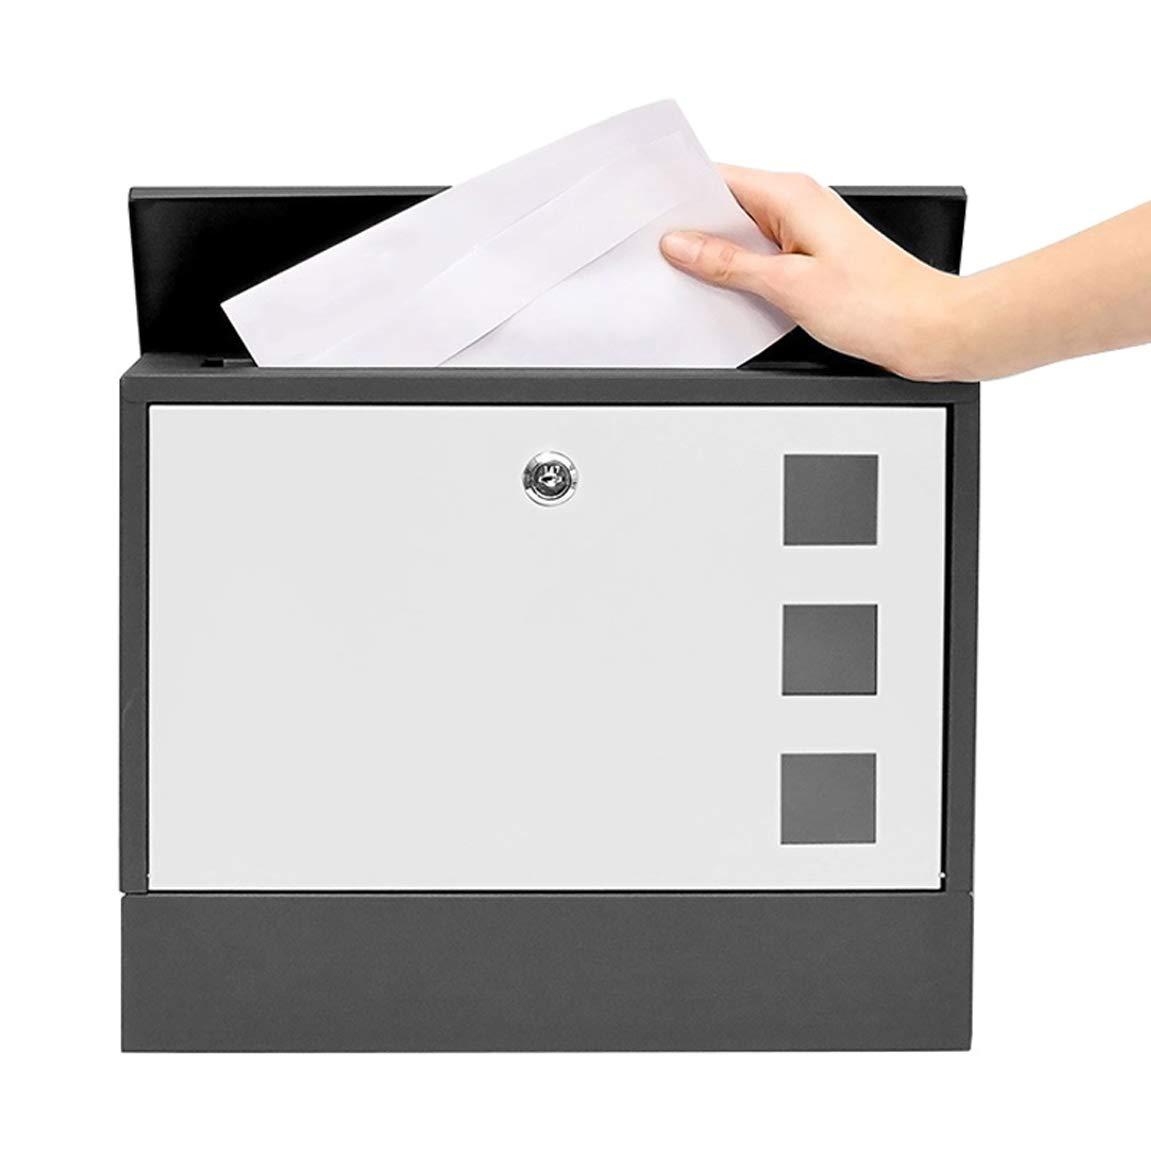 LRW ヴィラの郵便箱の壁の外に、ロック付きの屋外の箱、提案箱、錆びないと雨の証明メールボックス、白。   B07H8BQN46